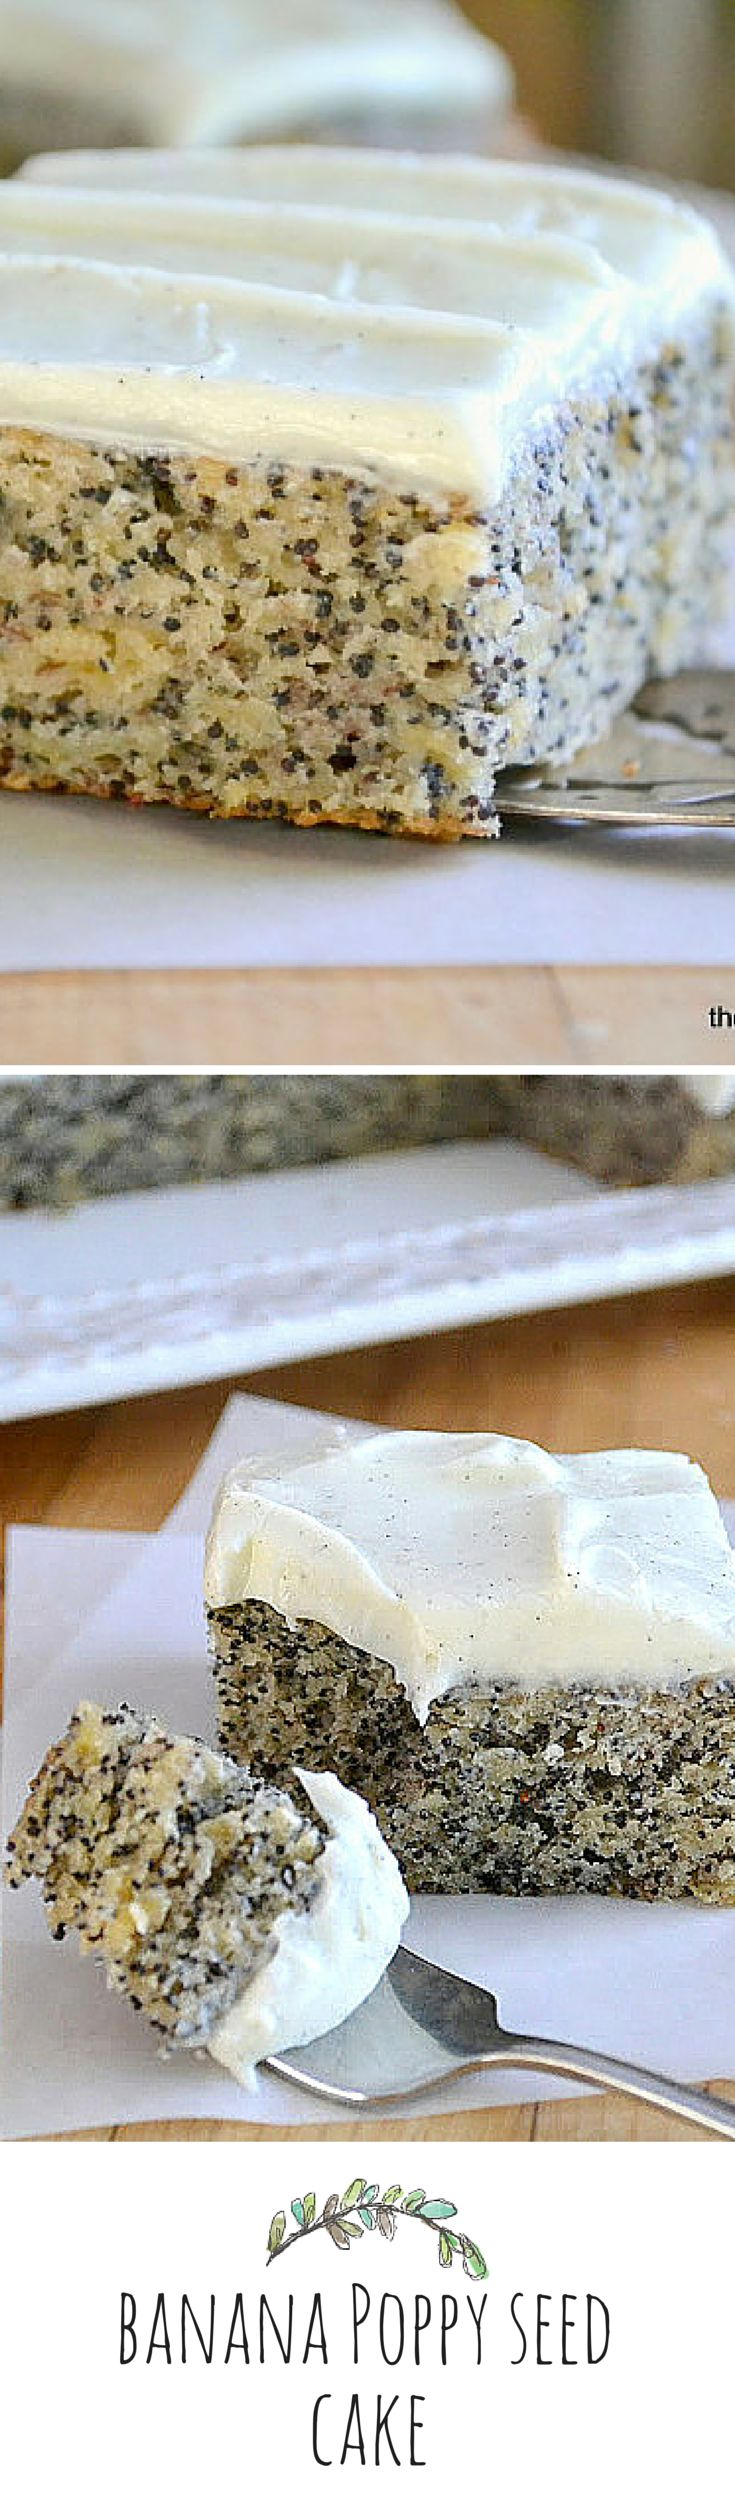 Banana Poppy Seed Cake with Vanilla Bean Frosting